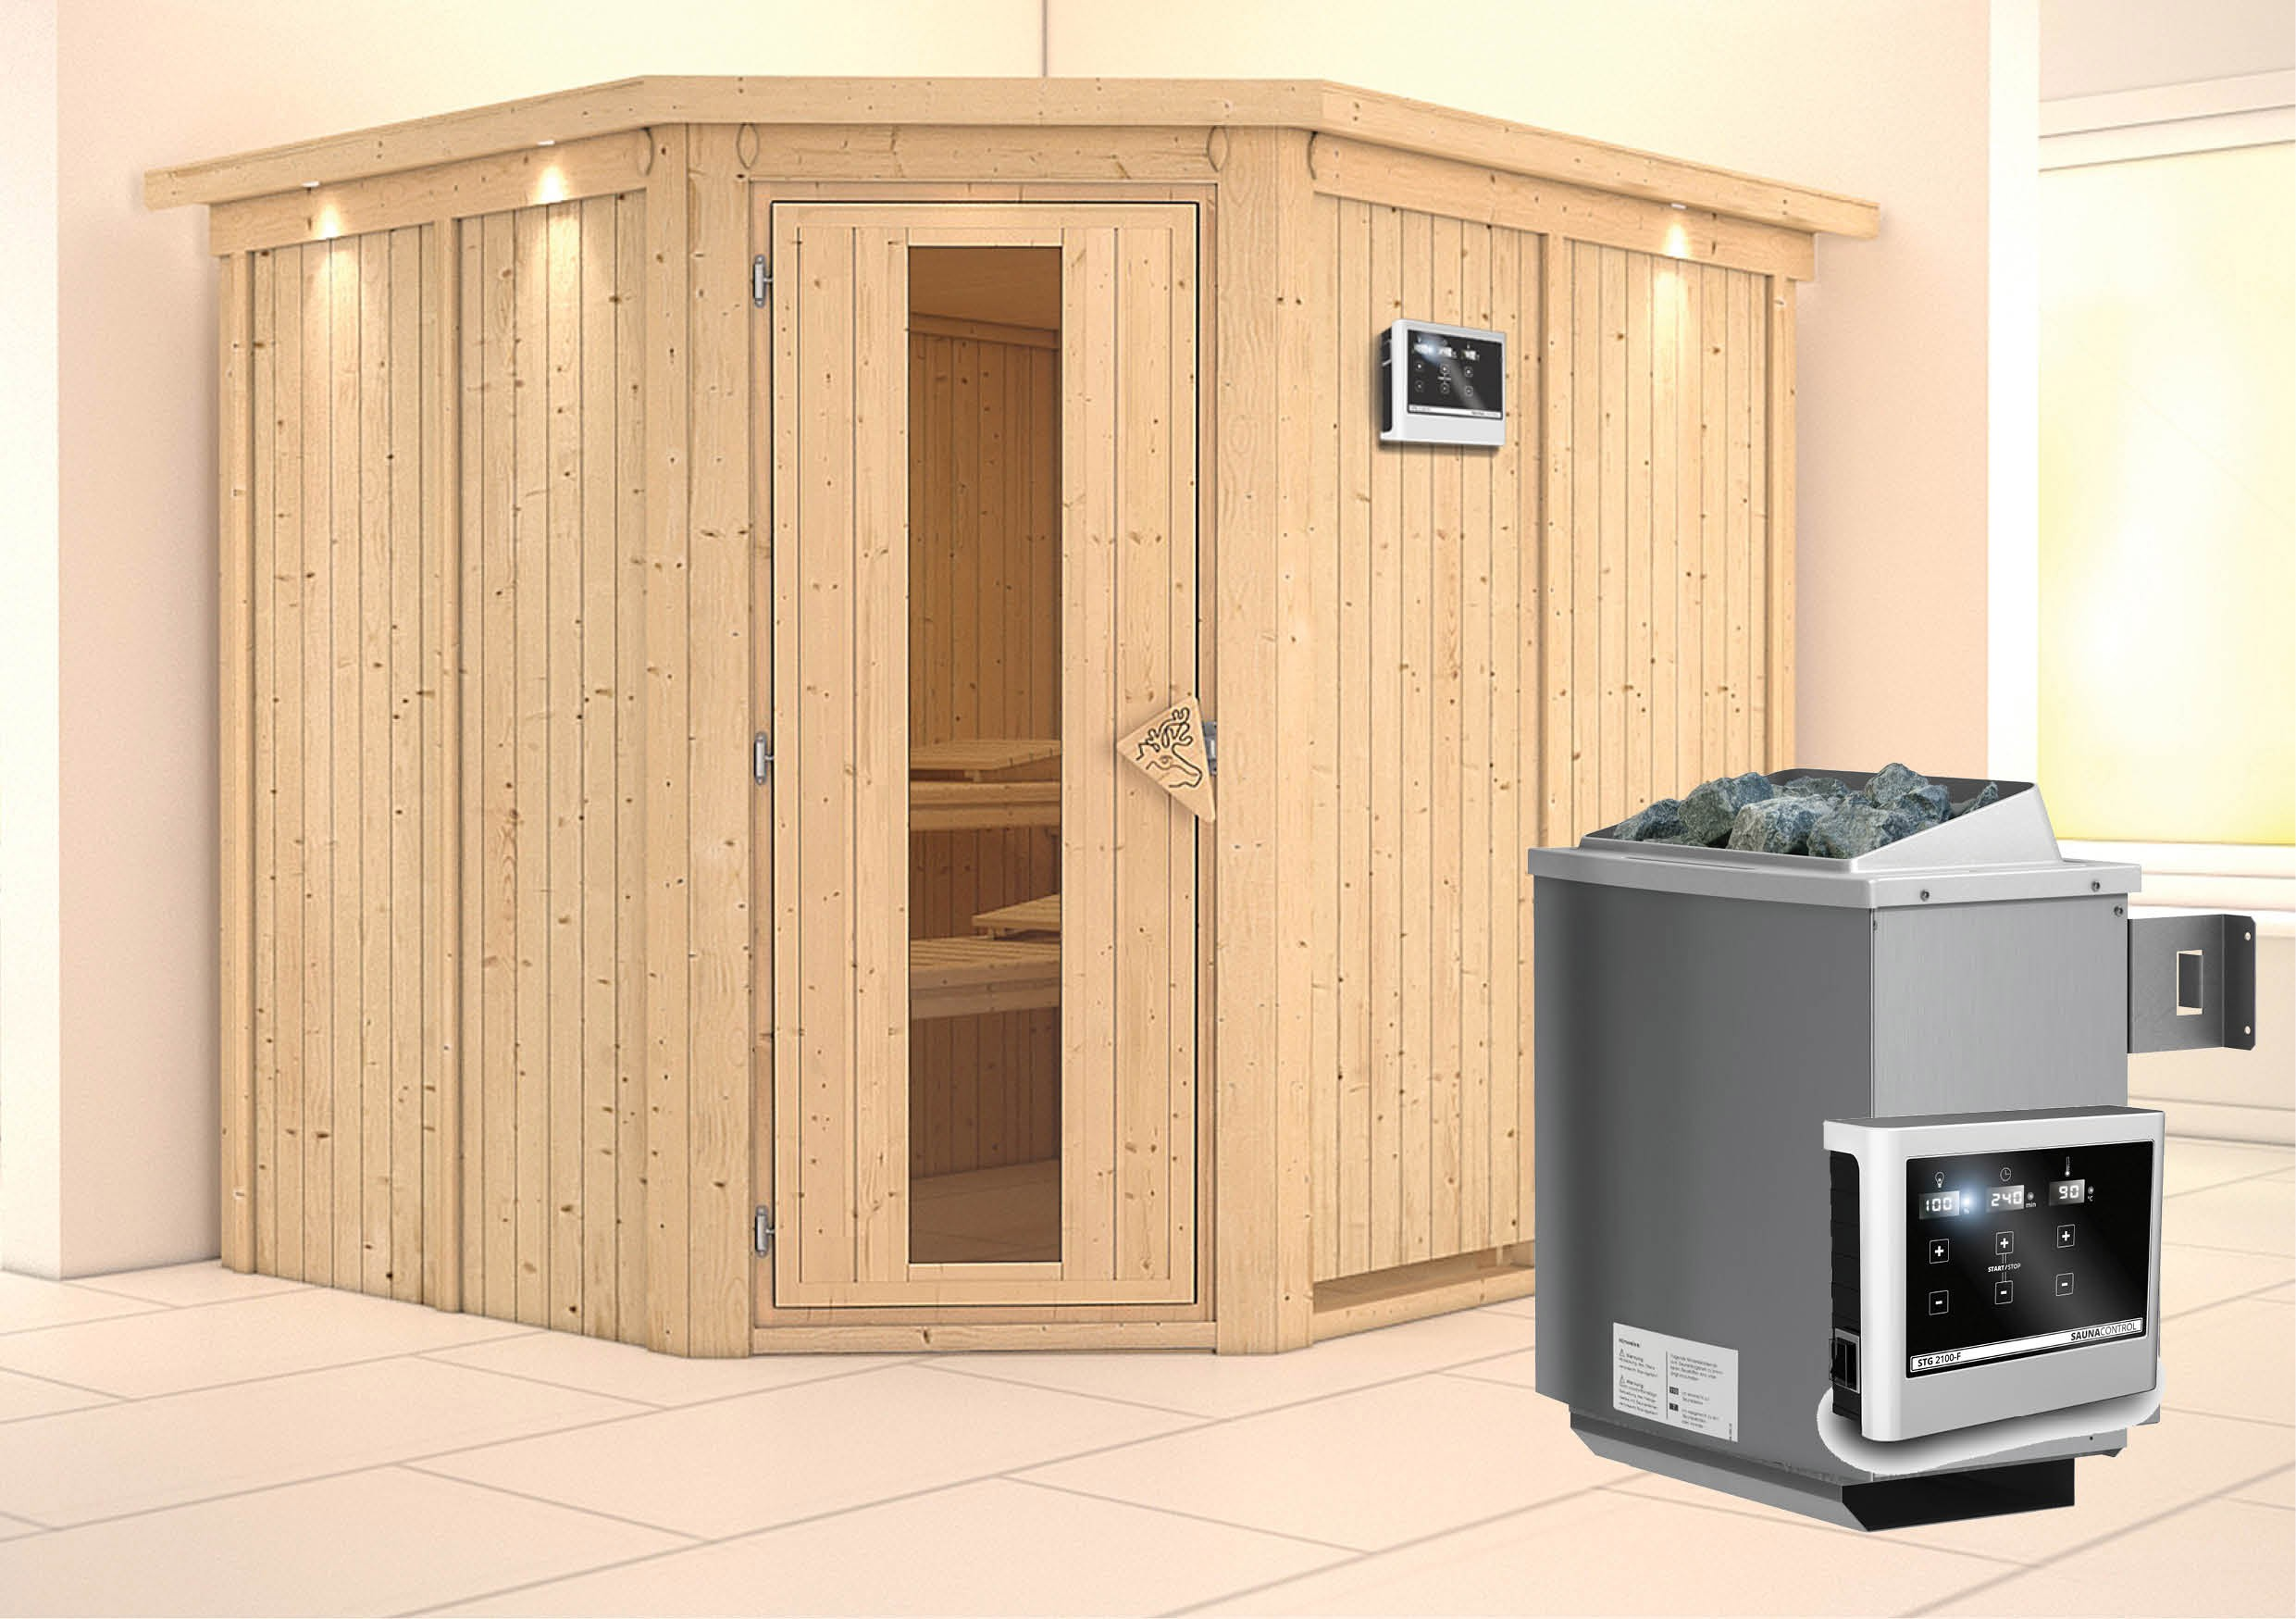 Karibu Sauna Malin 68mm Kranz Ofen 9kW extern Tür Holz Bild 1